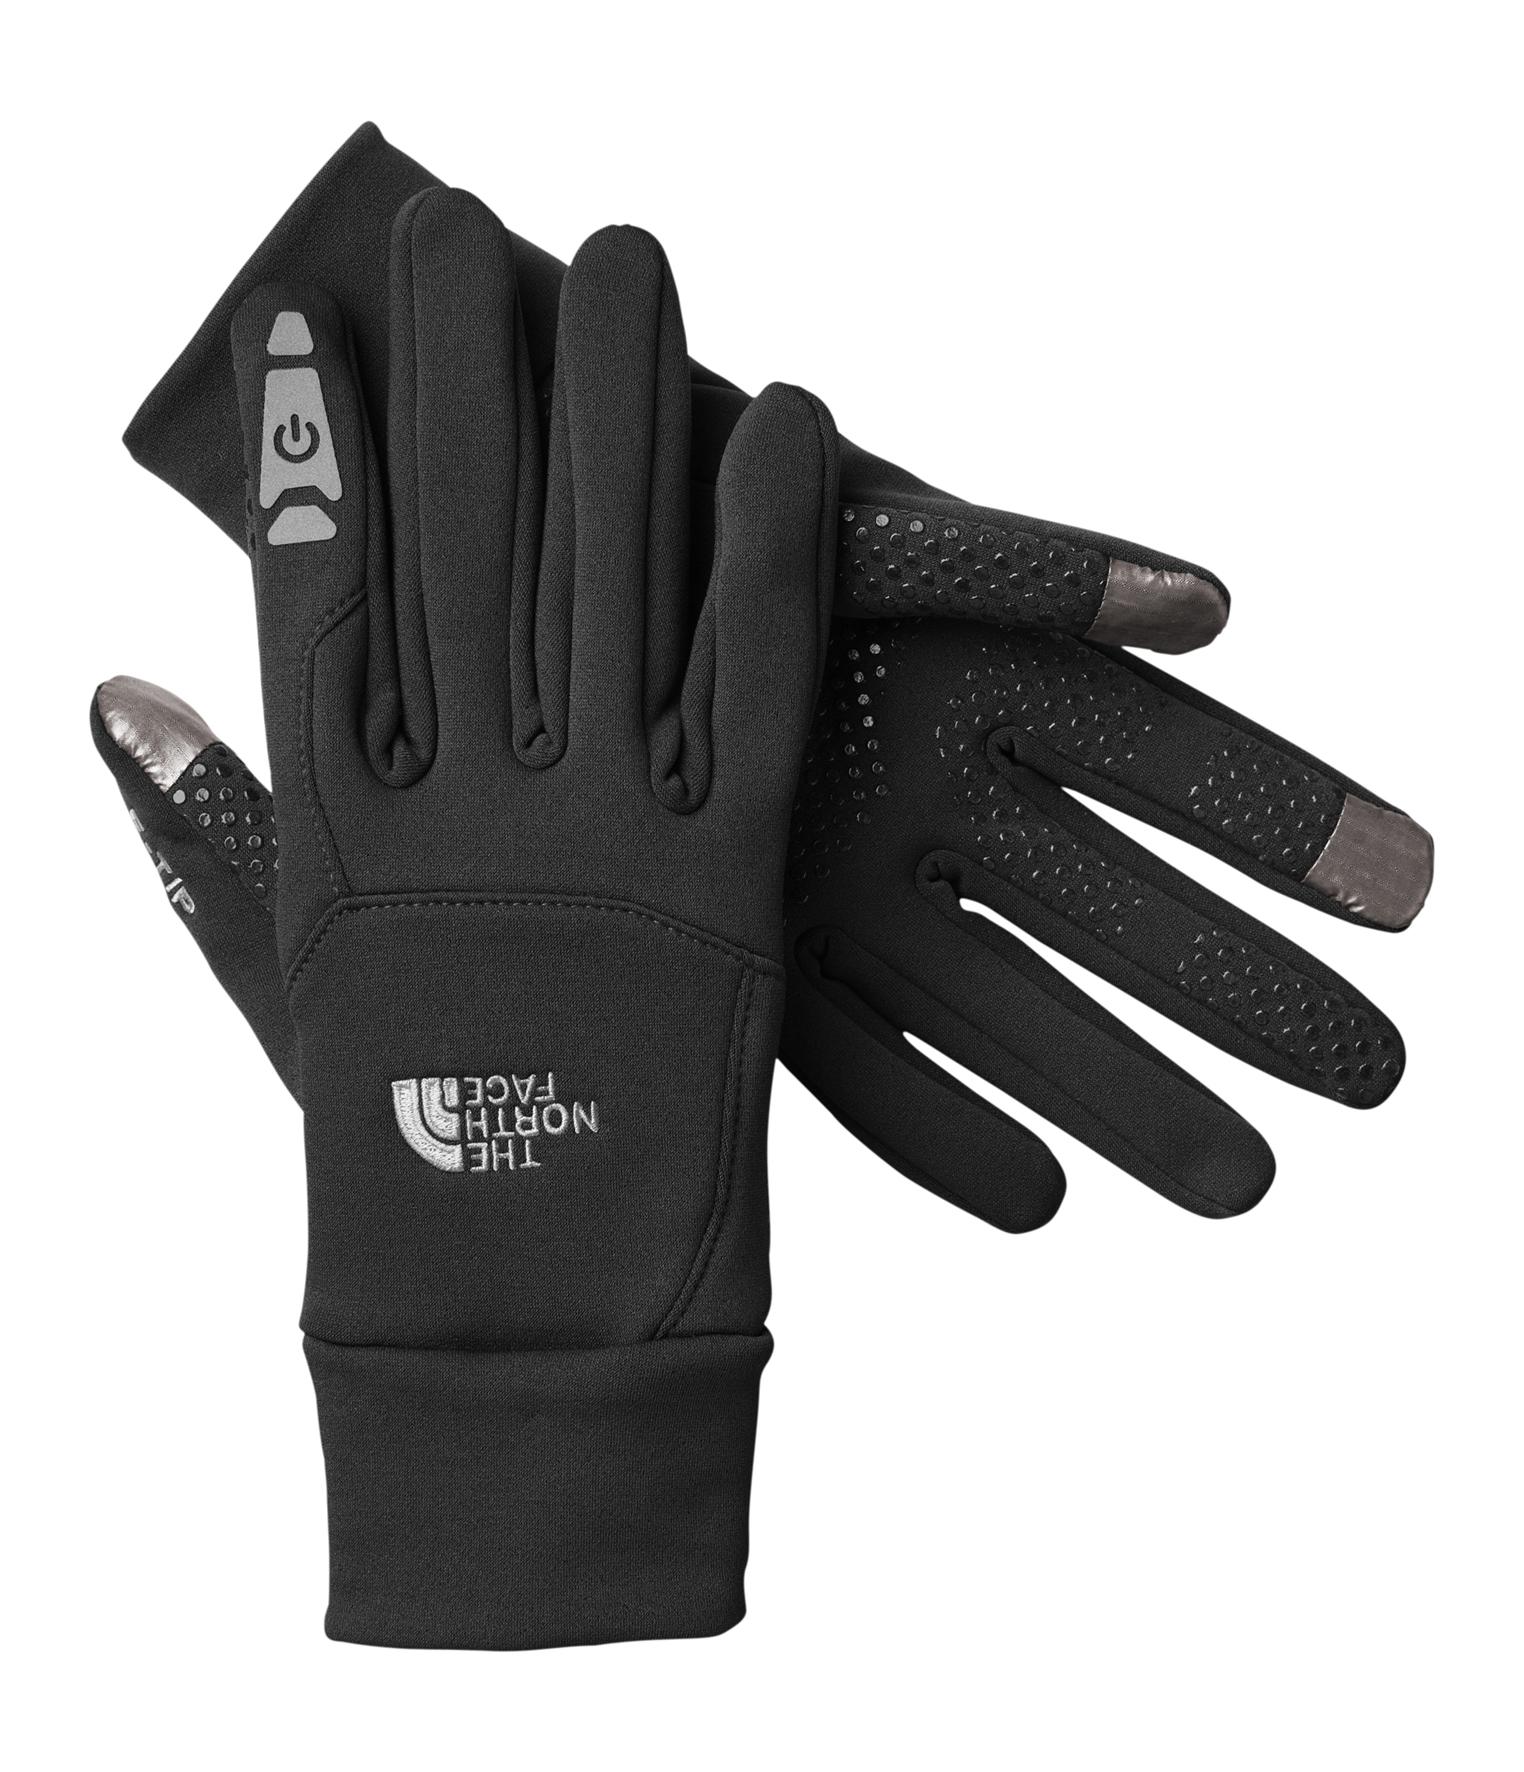 des gants qui fonctionnent avec crans tactiles. Black Bedroom Furniture Sets. Home Design Ideas